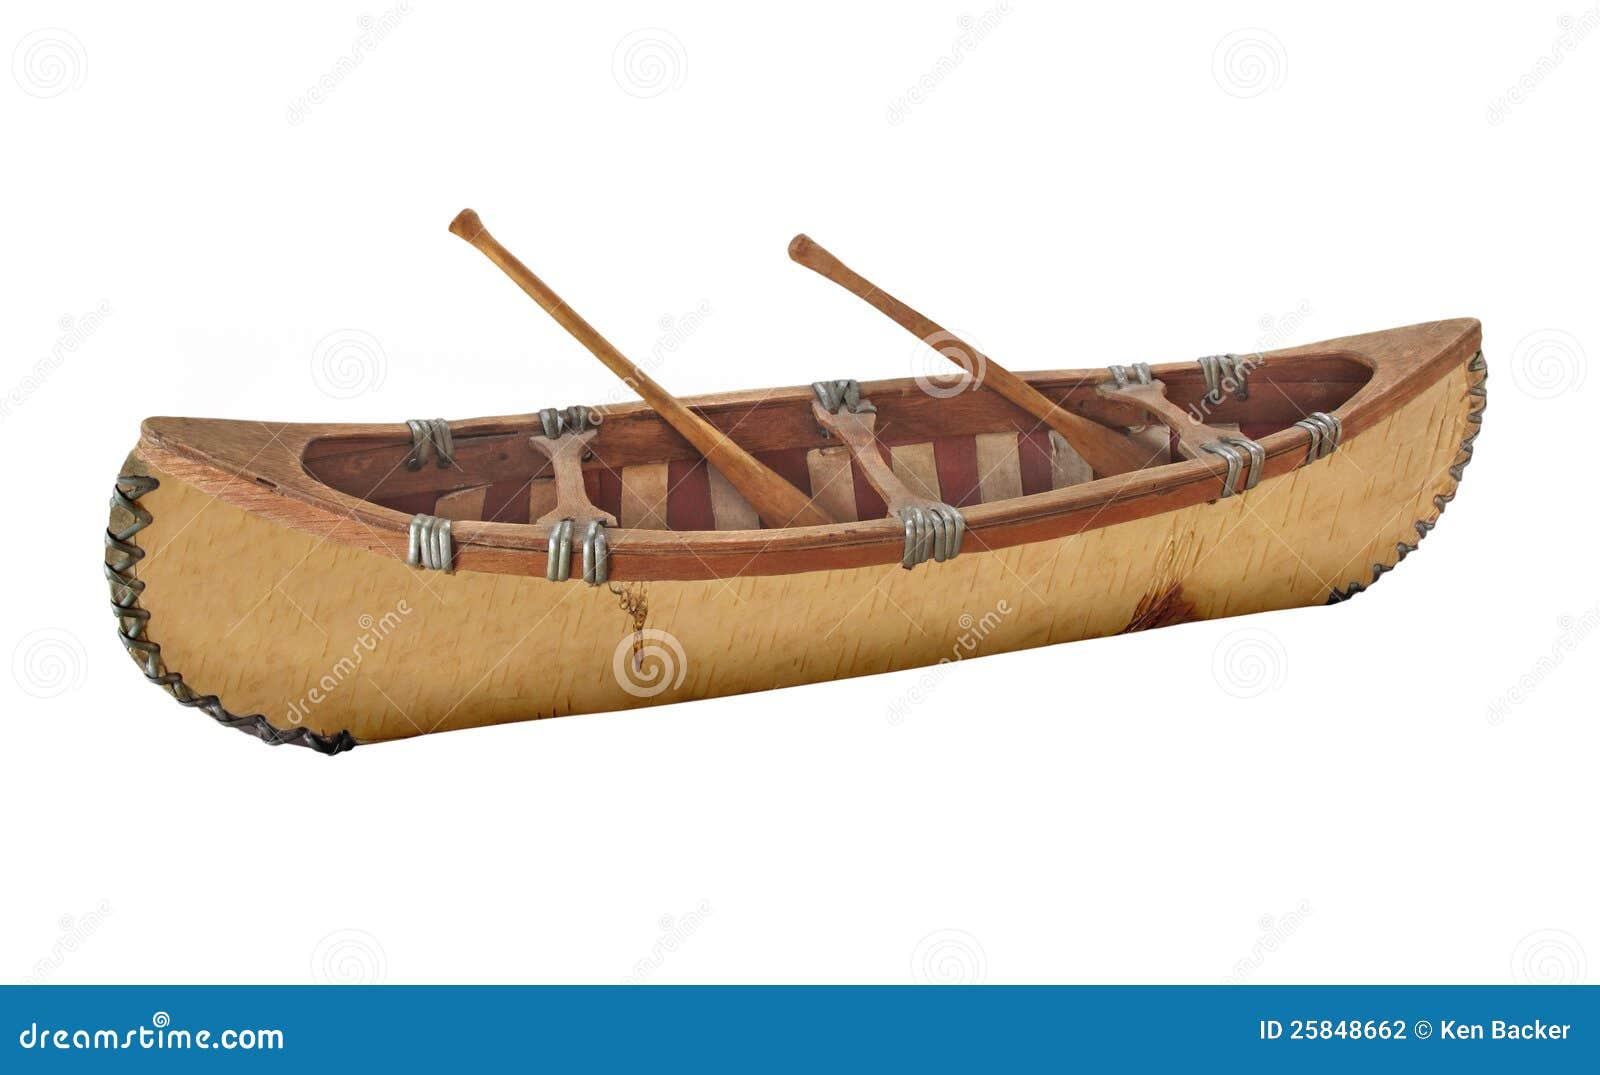 Close-up Of A Miniature Birch Bark Canoe Isolated. Stock Photo - Image: 25848662